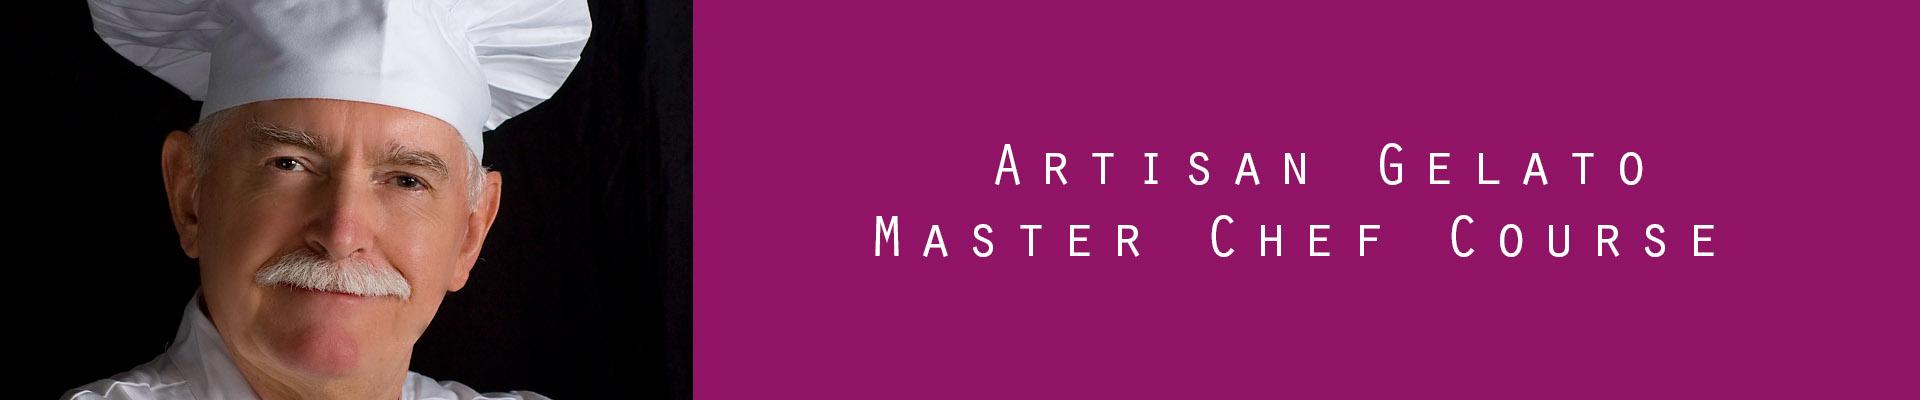 2-Artisan-Gelato-Master-Chef